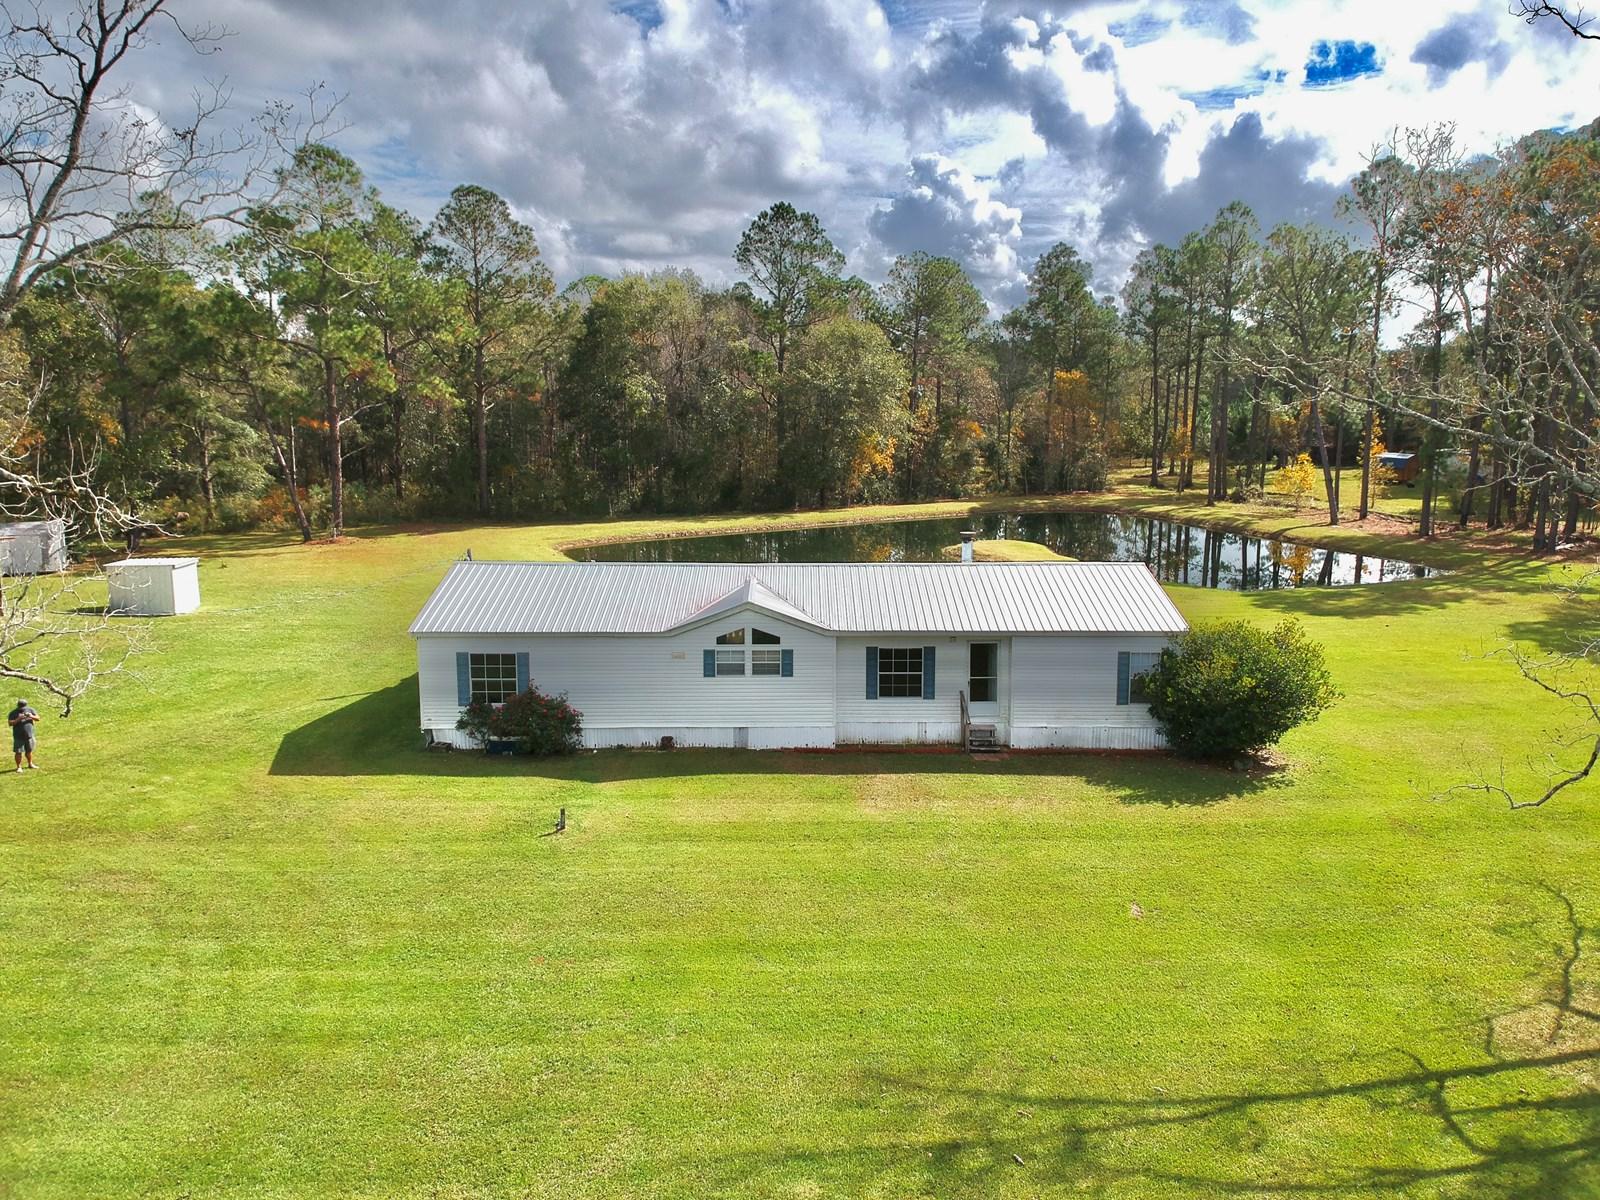 Home for sale Bonifay, Florida